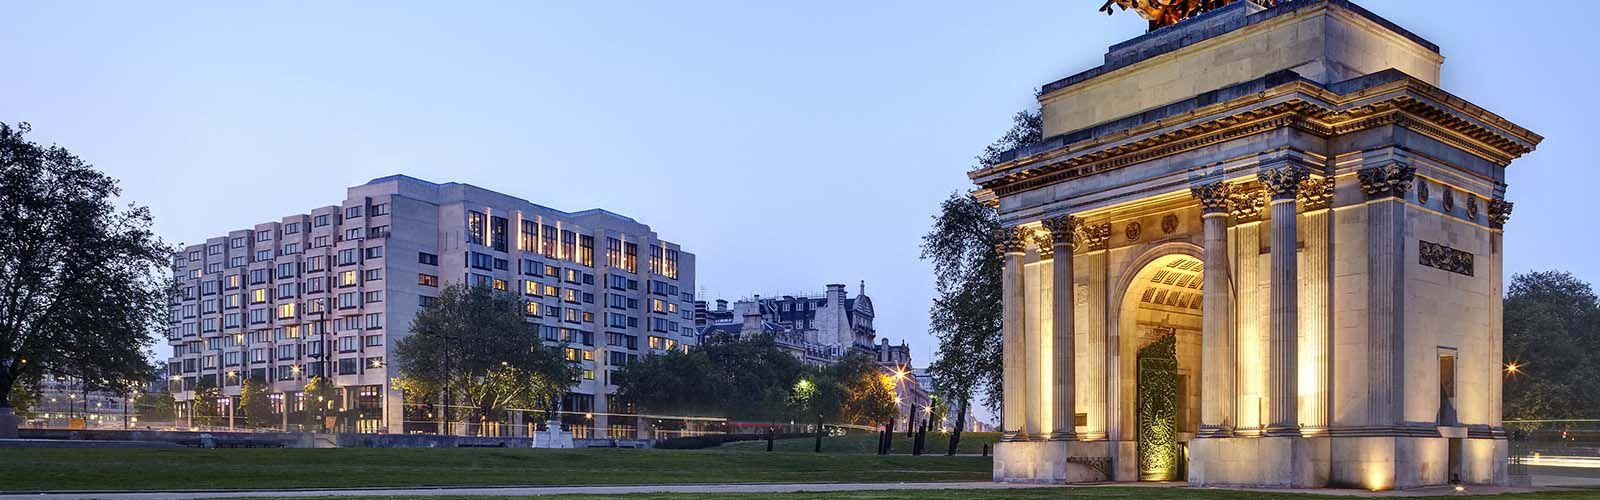 Hotel Reviews, Hotel Deals & Hotels Near Me - IHG